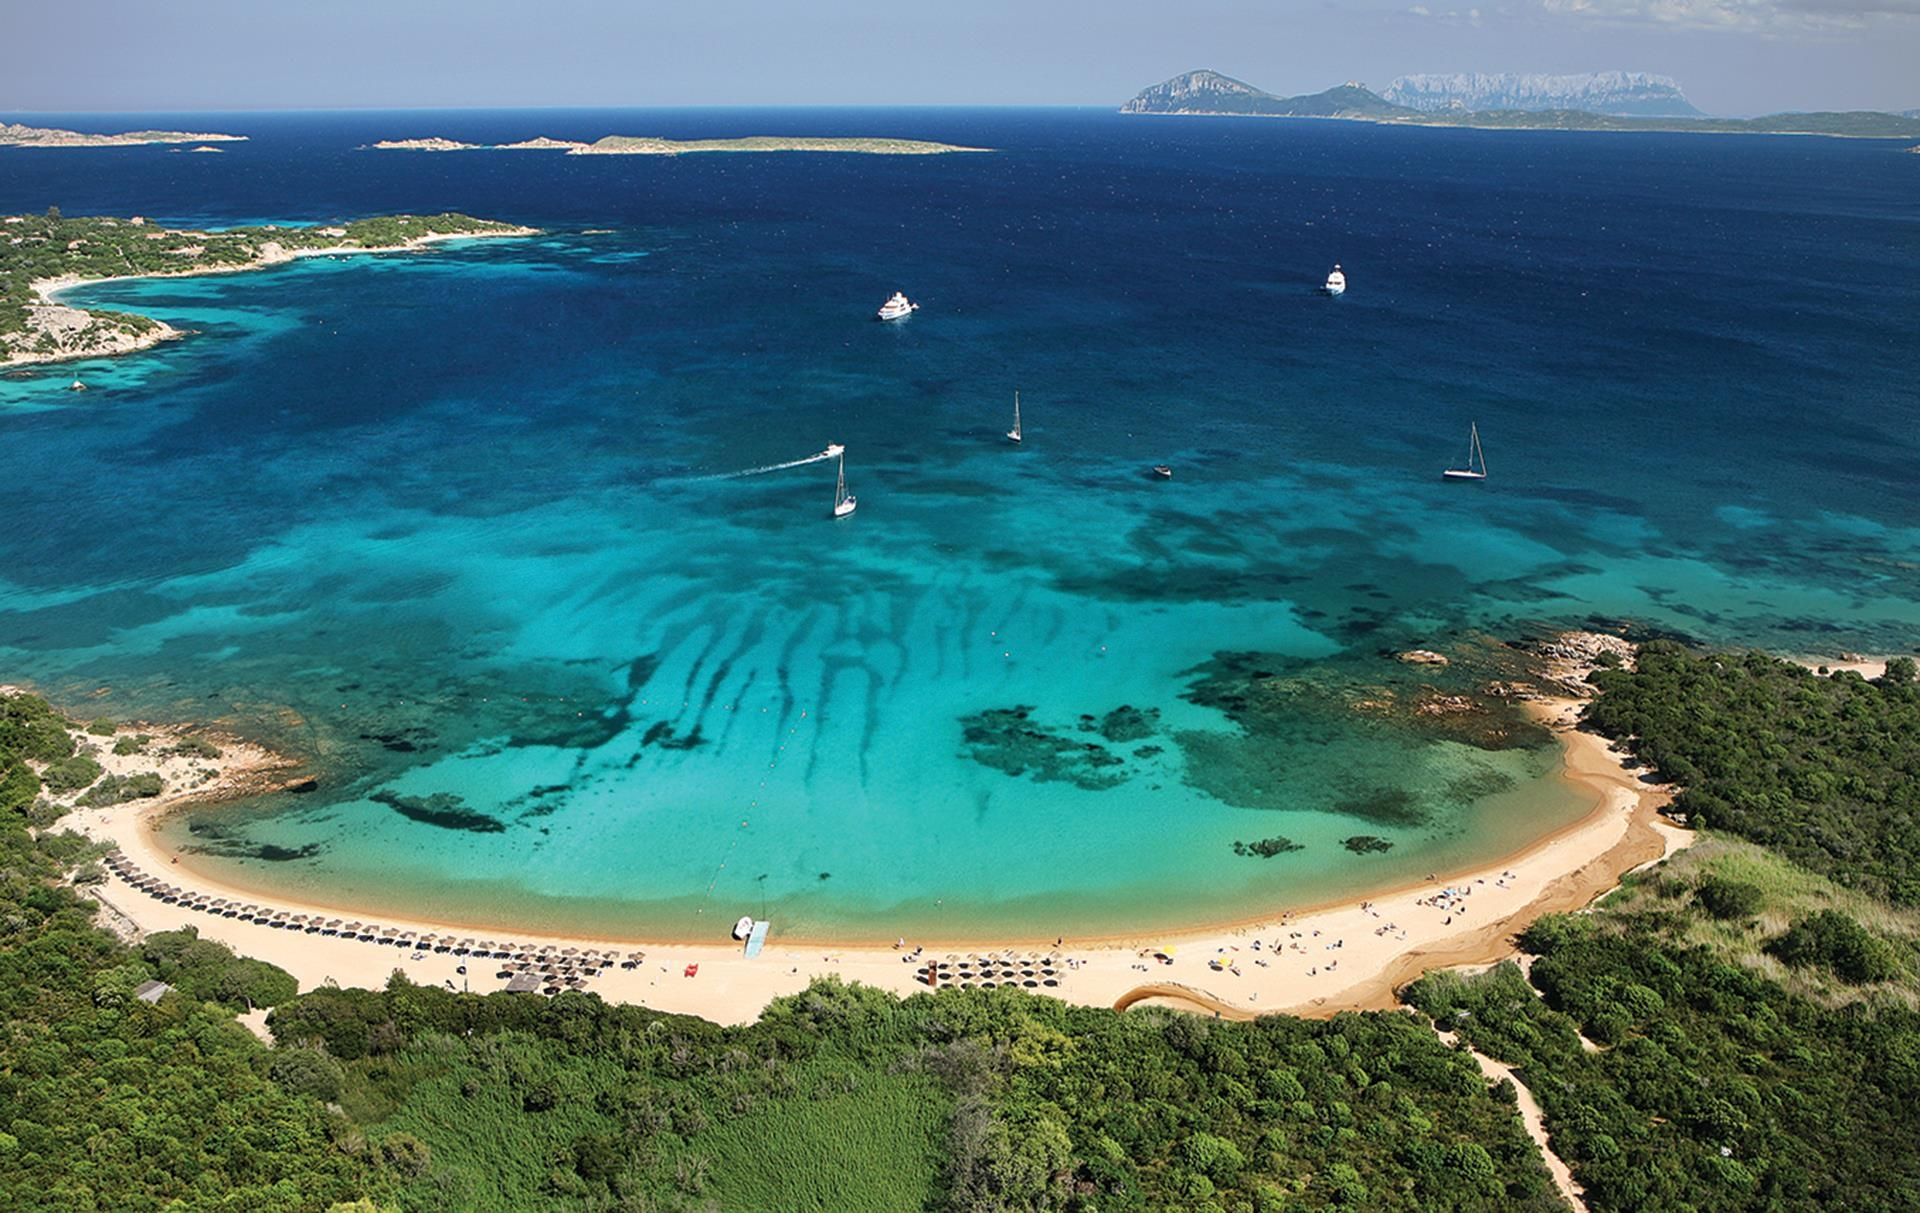 http://extranet.jetlinetravel.info/express-images/express_costa_corallina_sardinia_3.jpg